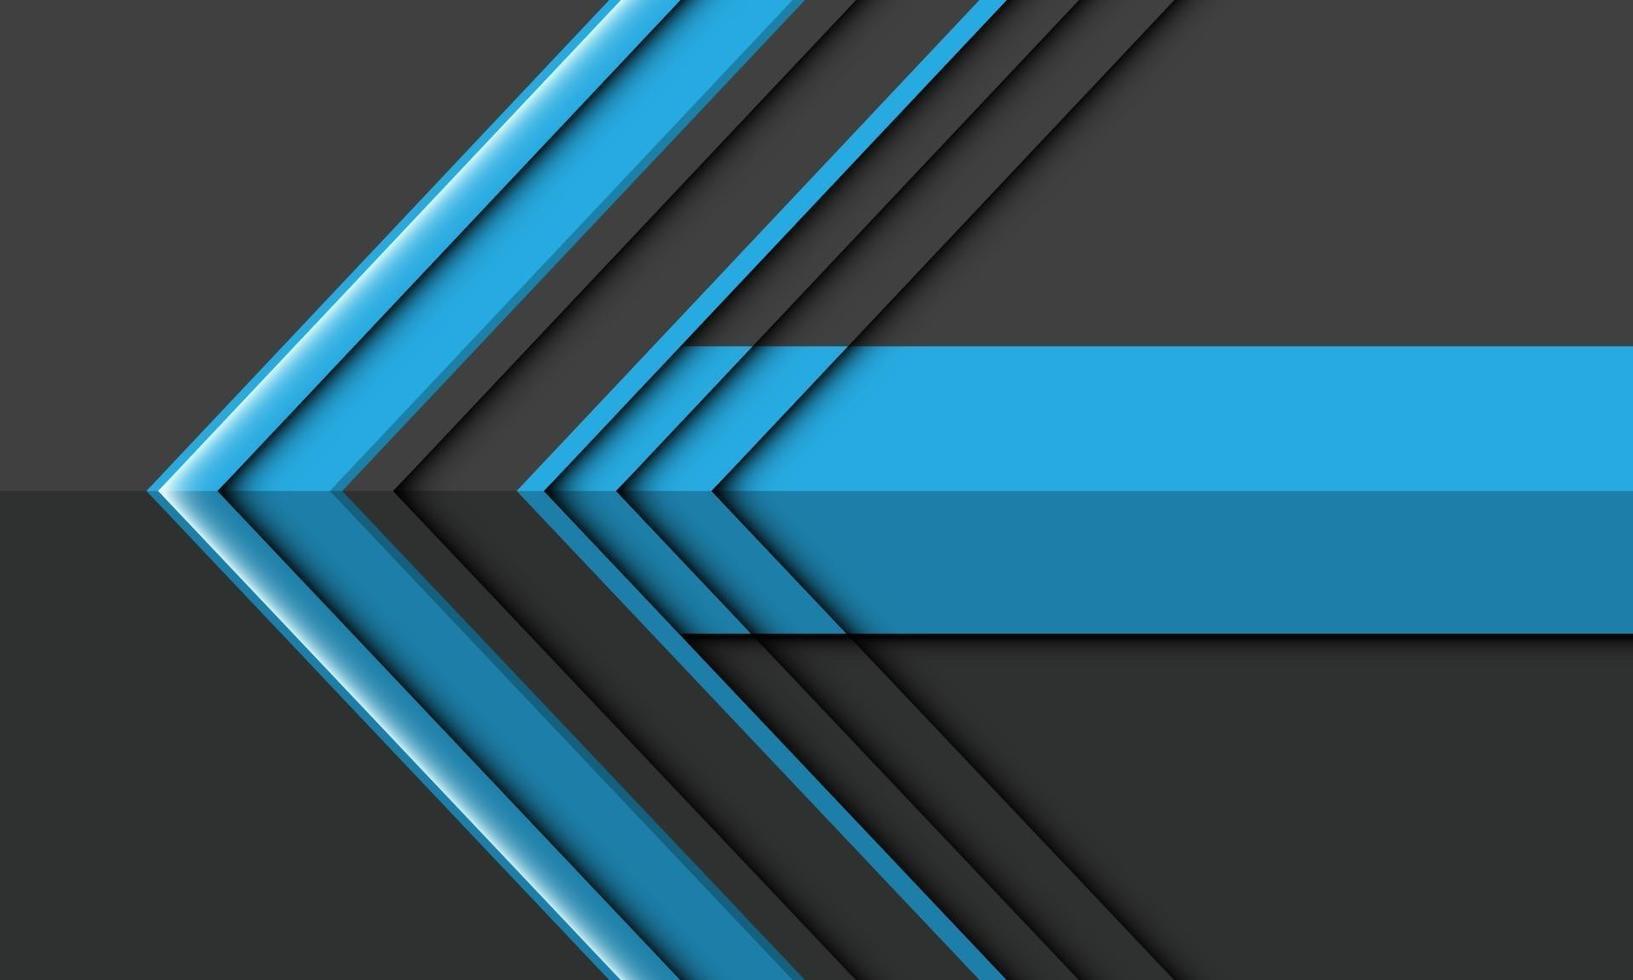 Ilustración de vector de fondo futurista moderno diseño de dirección de flecha gris azul abstracto.